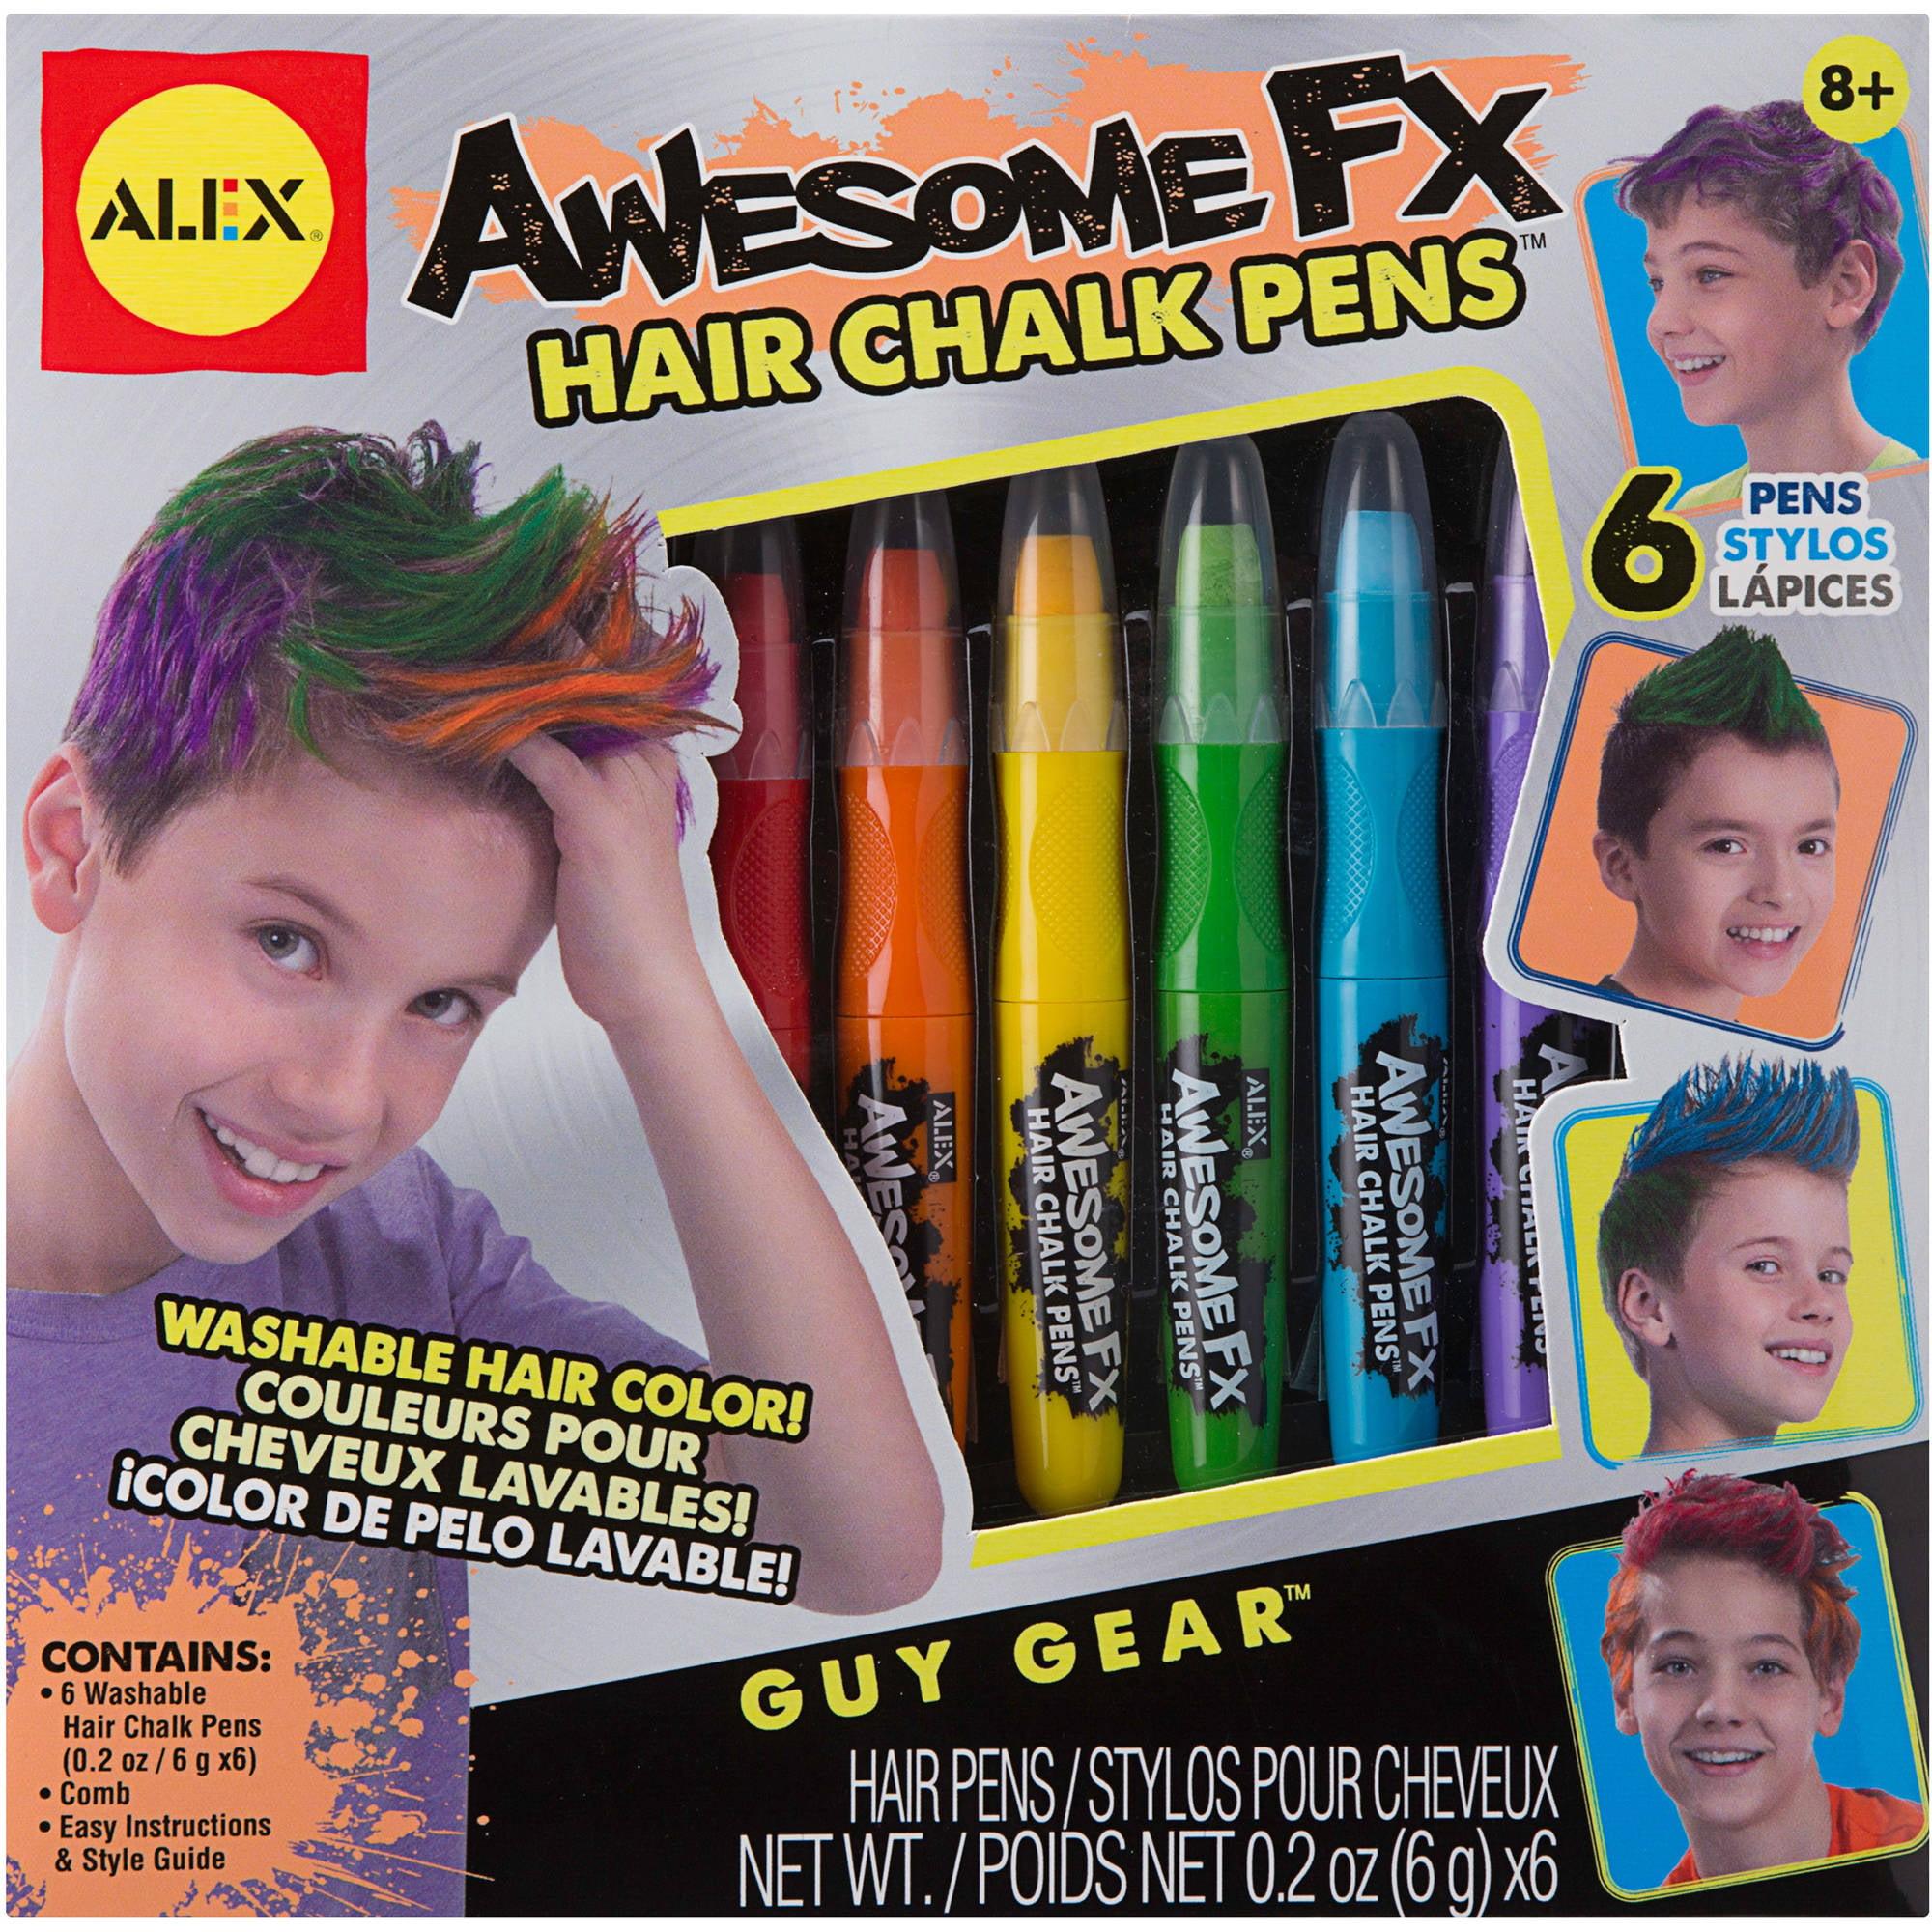 ALEX Toys Awesome FX Hair Chalk Pens Walmart